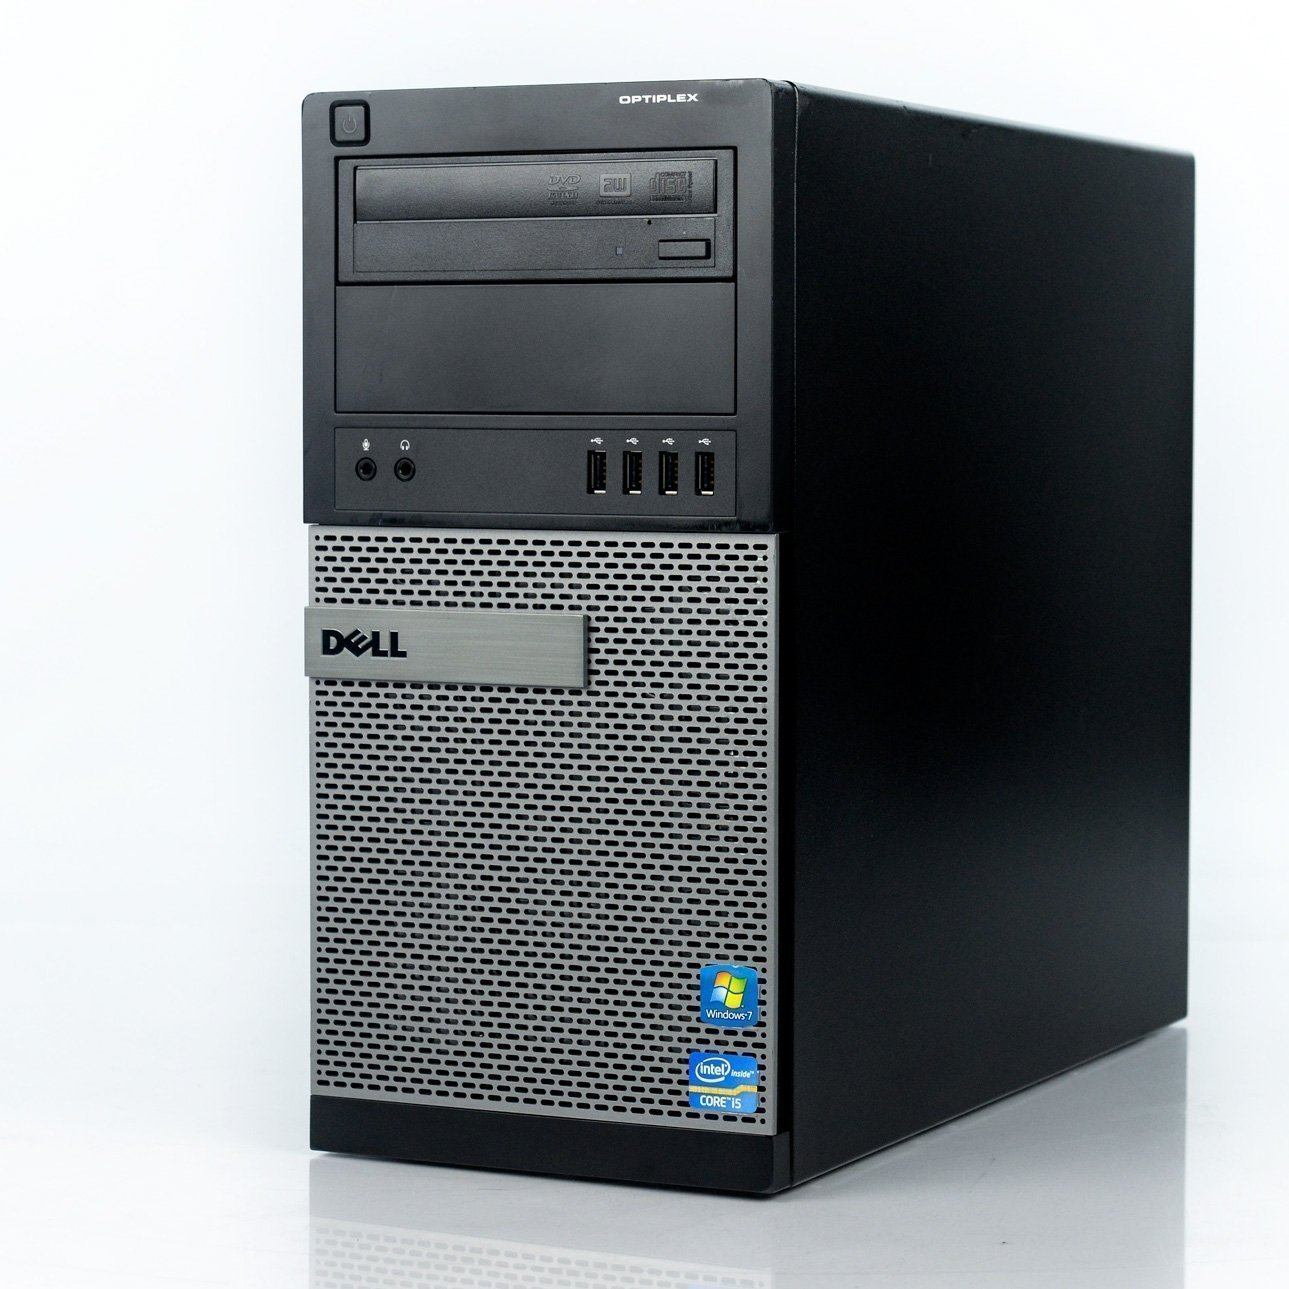 Dell Optiplex 790 MiniTower High Performance Desktop Computer PC (Intel  Quad-Core i7-2600 up to 3 8GHz, 8GB RAM, 1TB HDD, DVDRW, Windows 7